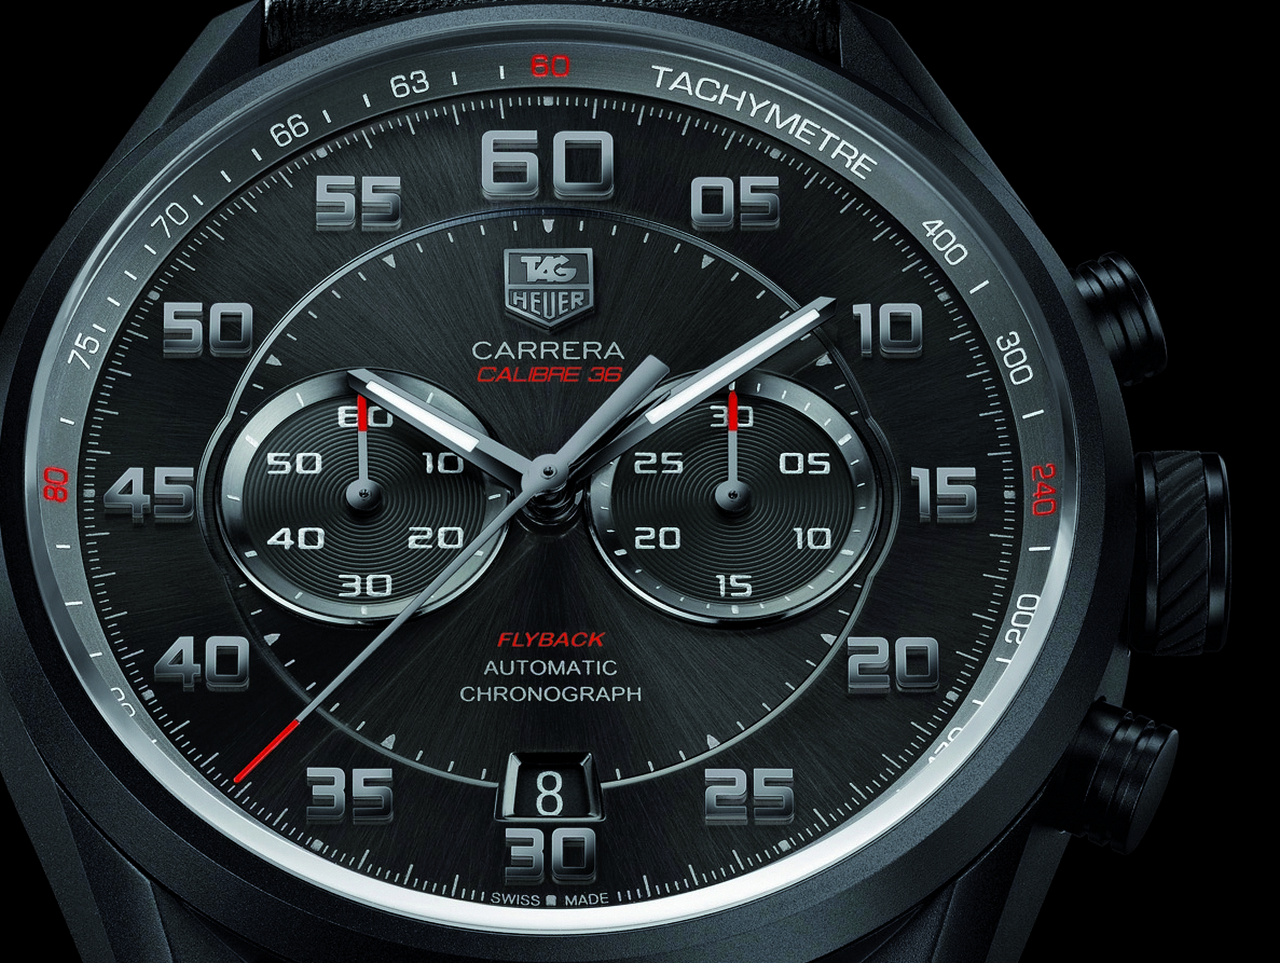 baselworld-2013tag-heuer-carrera-calibre-36-chronograph-flyback-racing_0-100_2